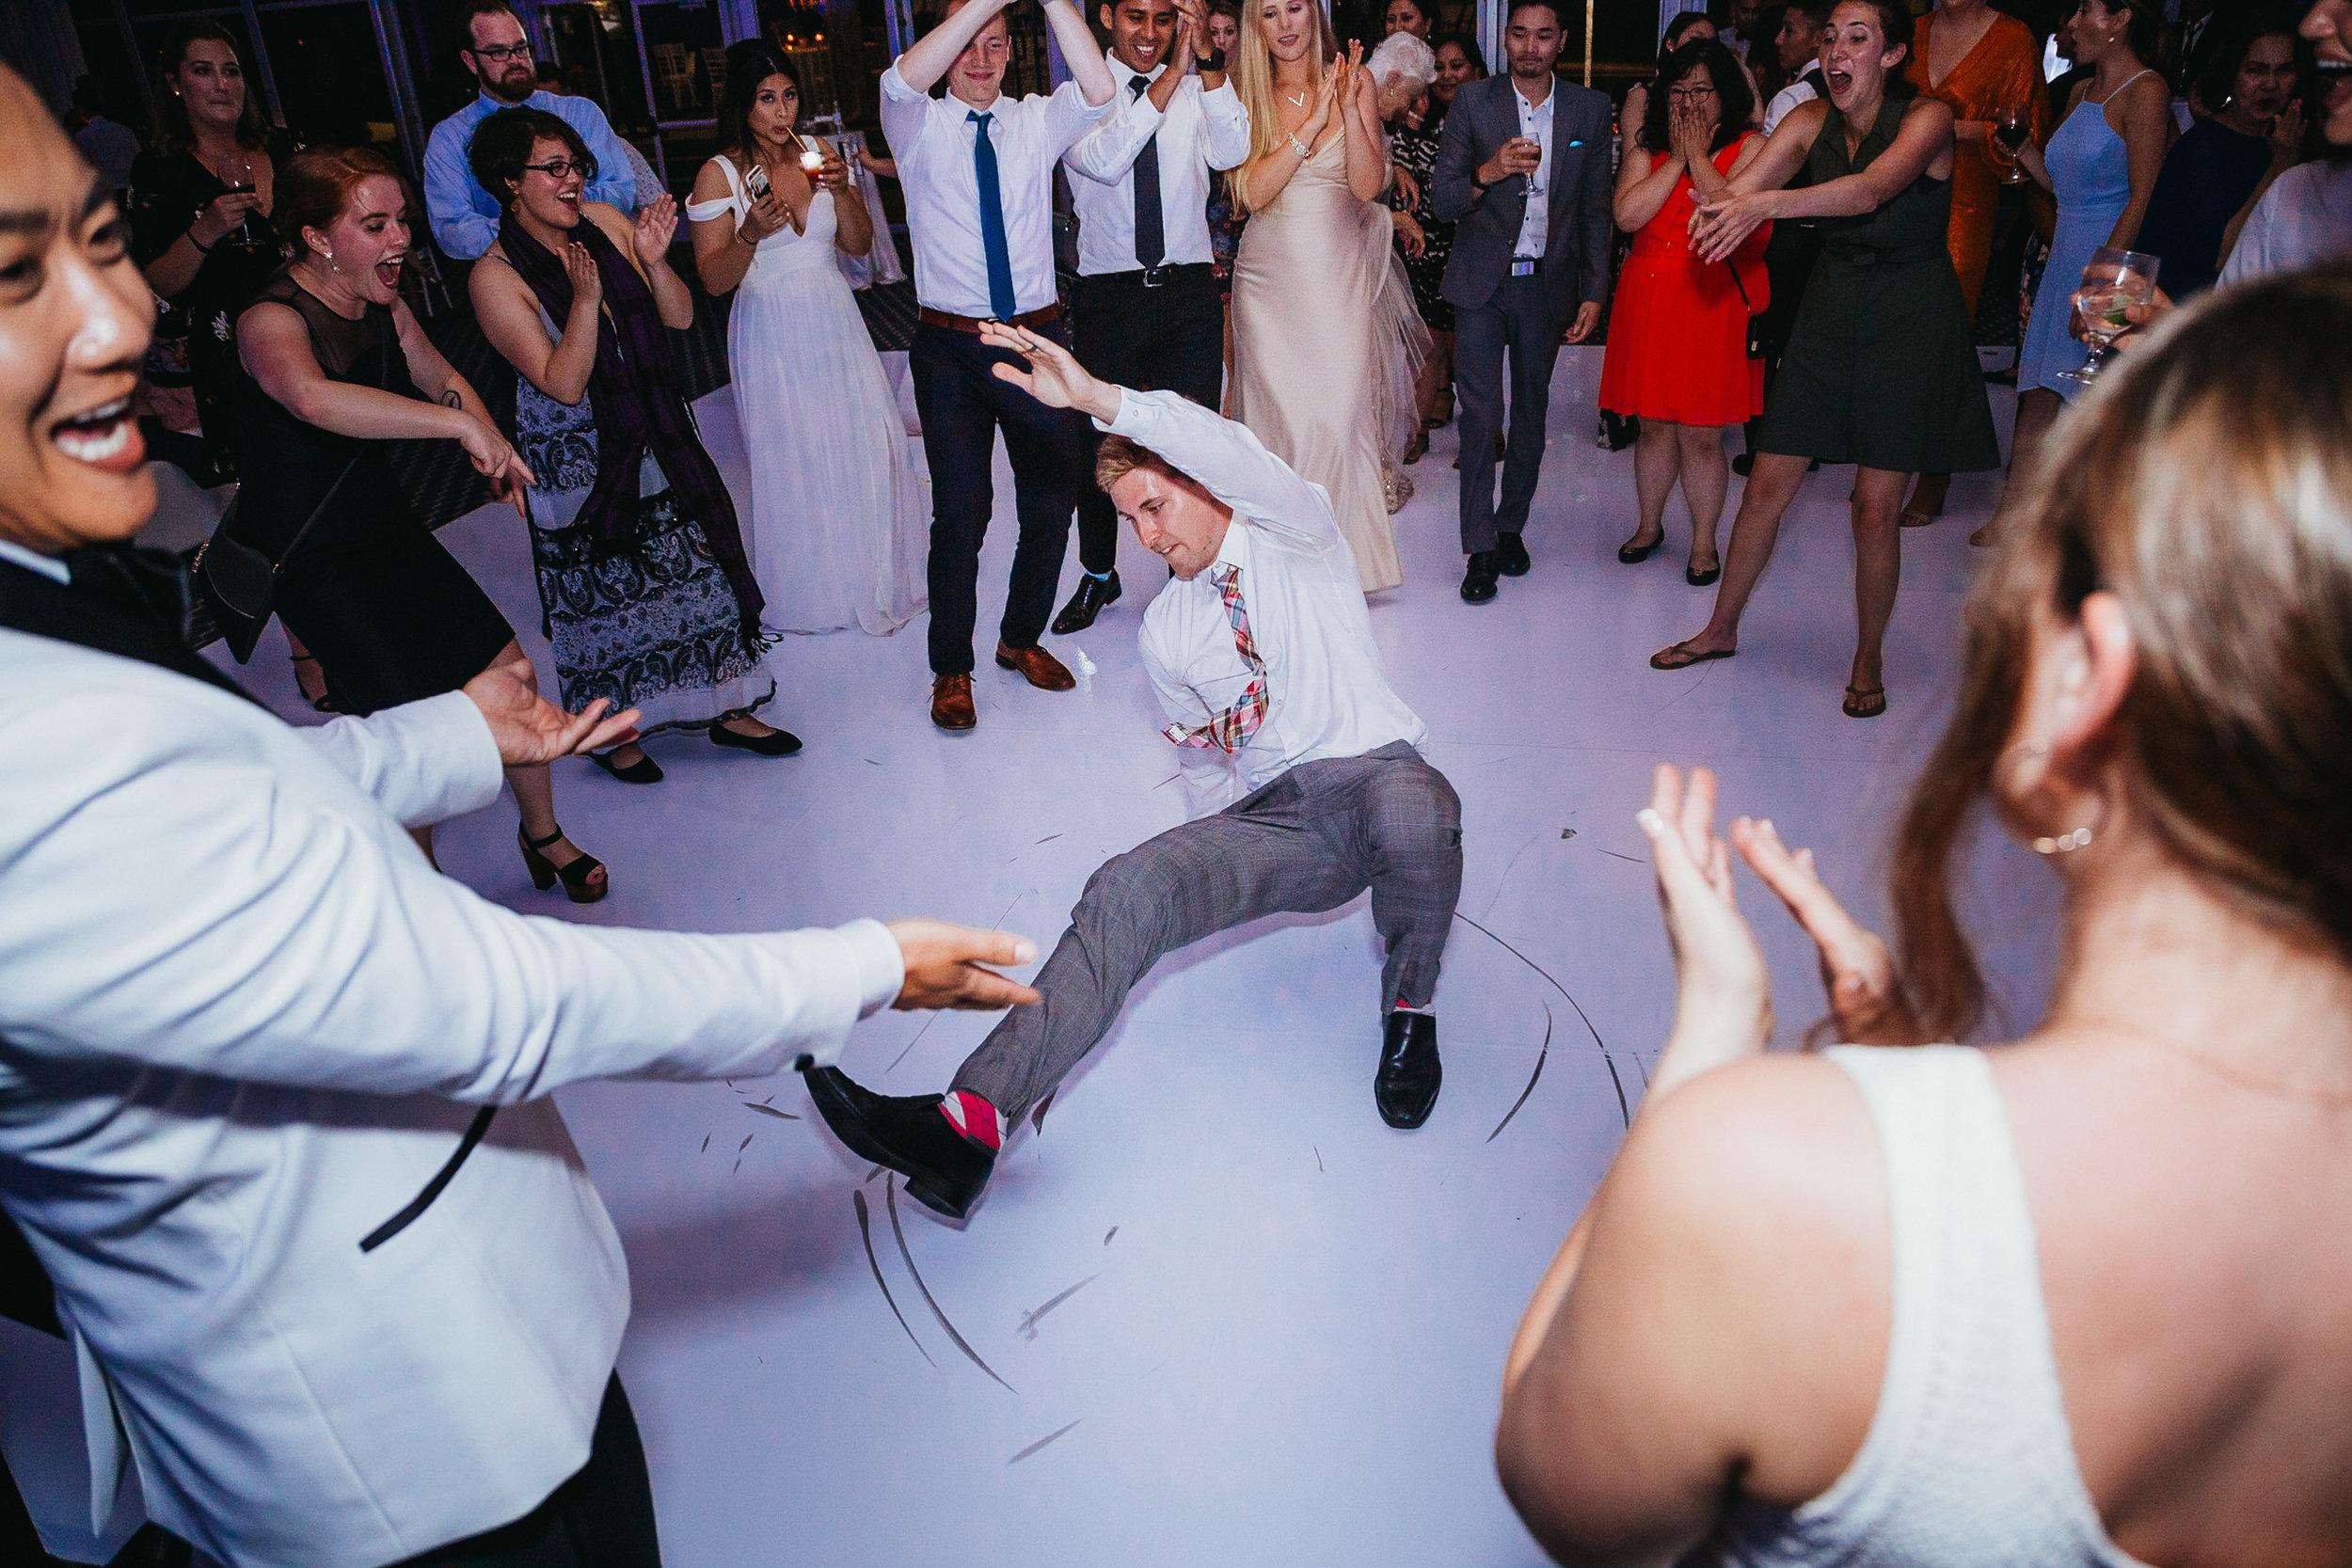 rebeccaylasotras-sandiego-lgbt-wedding-photography-breakdancing-dance-party.jpg